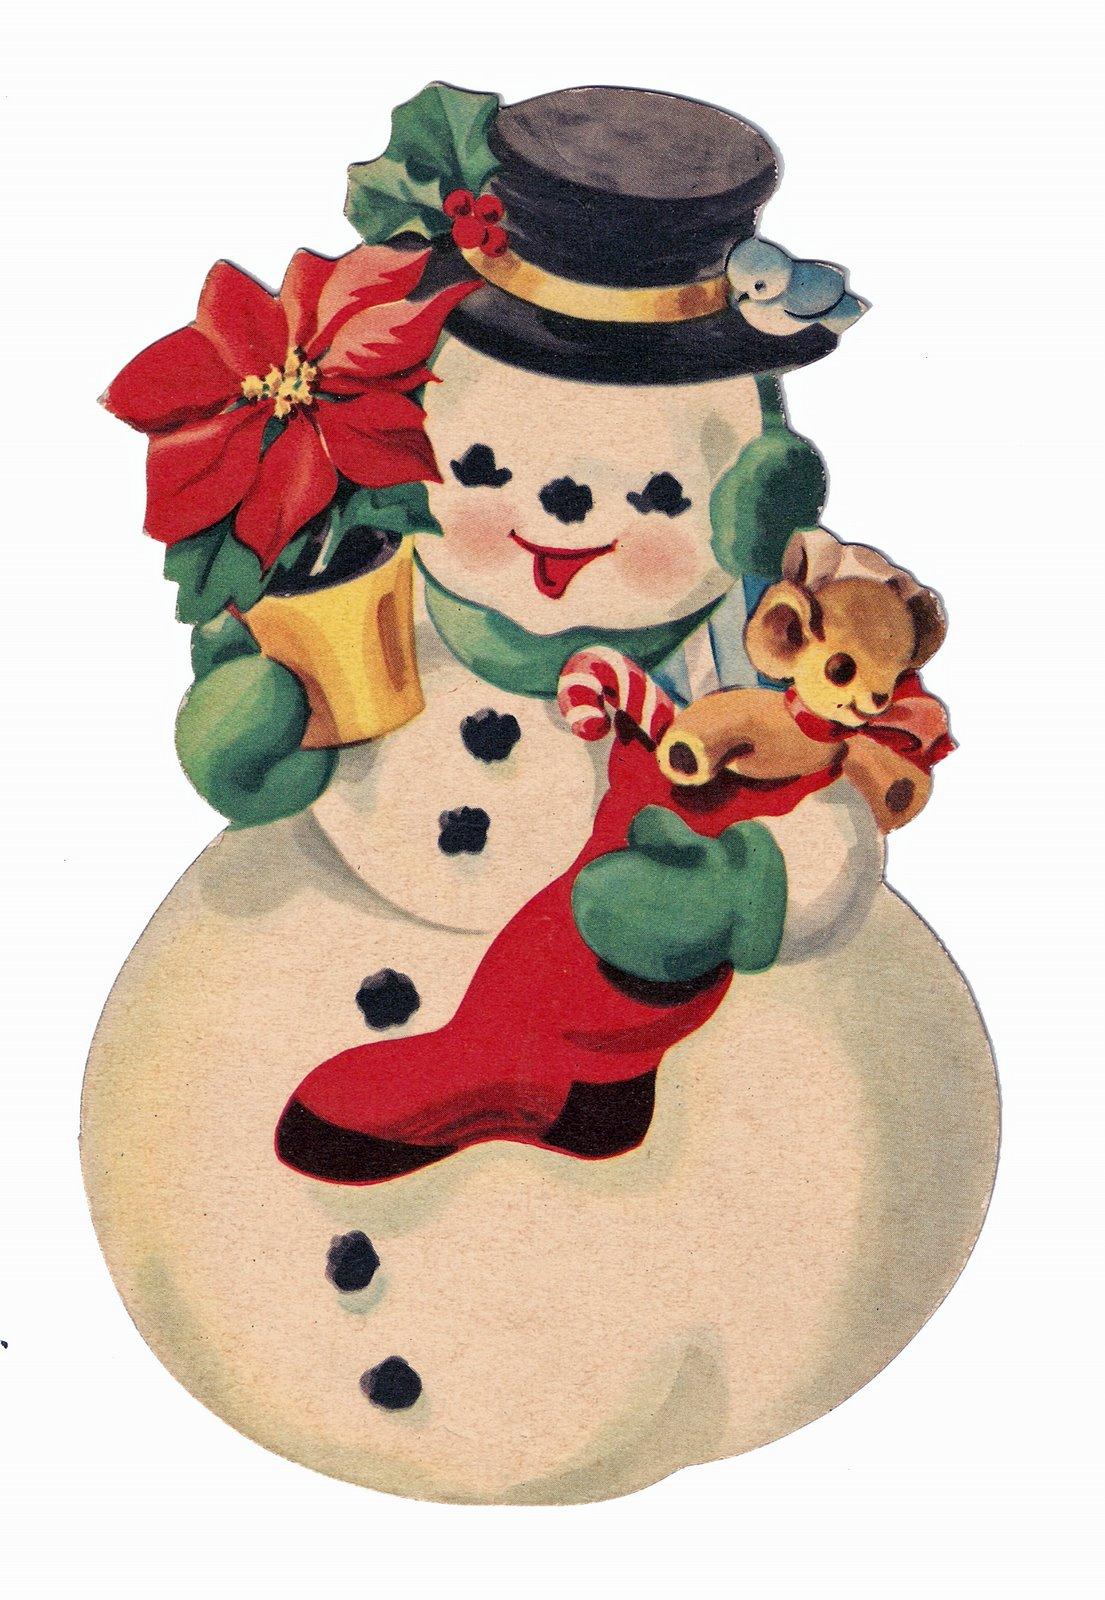 Free Christmas Printable: Nostalgic Collage': Merry Christmas! Free Victorian Images